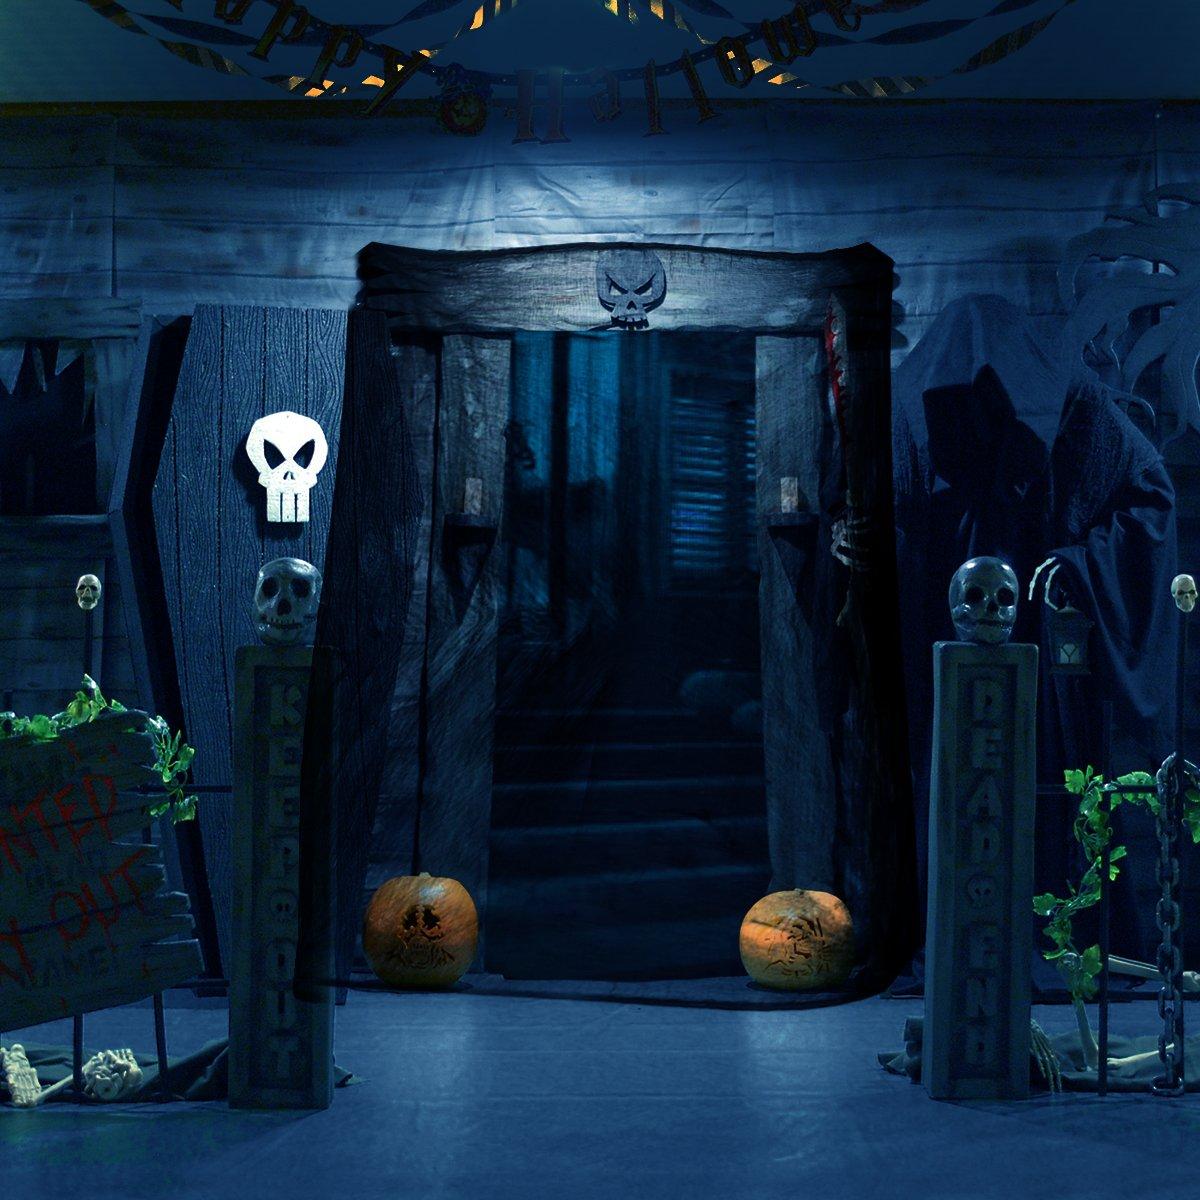 Unomor Black Creepy Cloth, Spooky Halloween Decorations